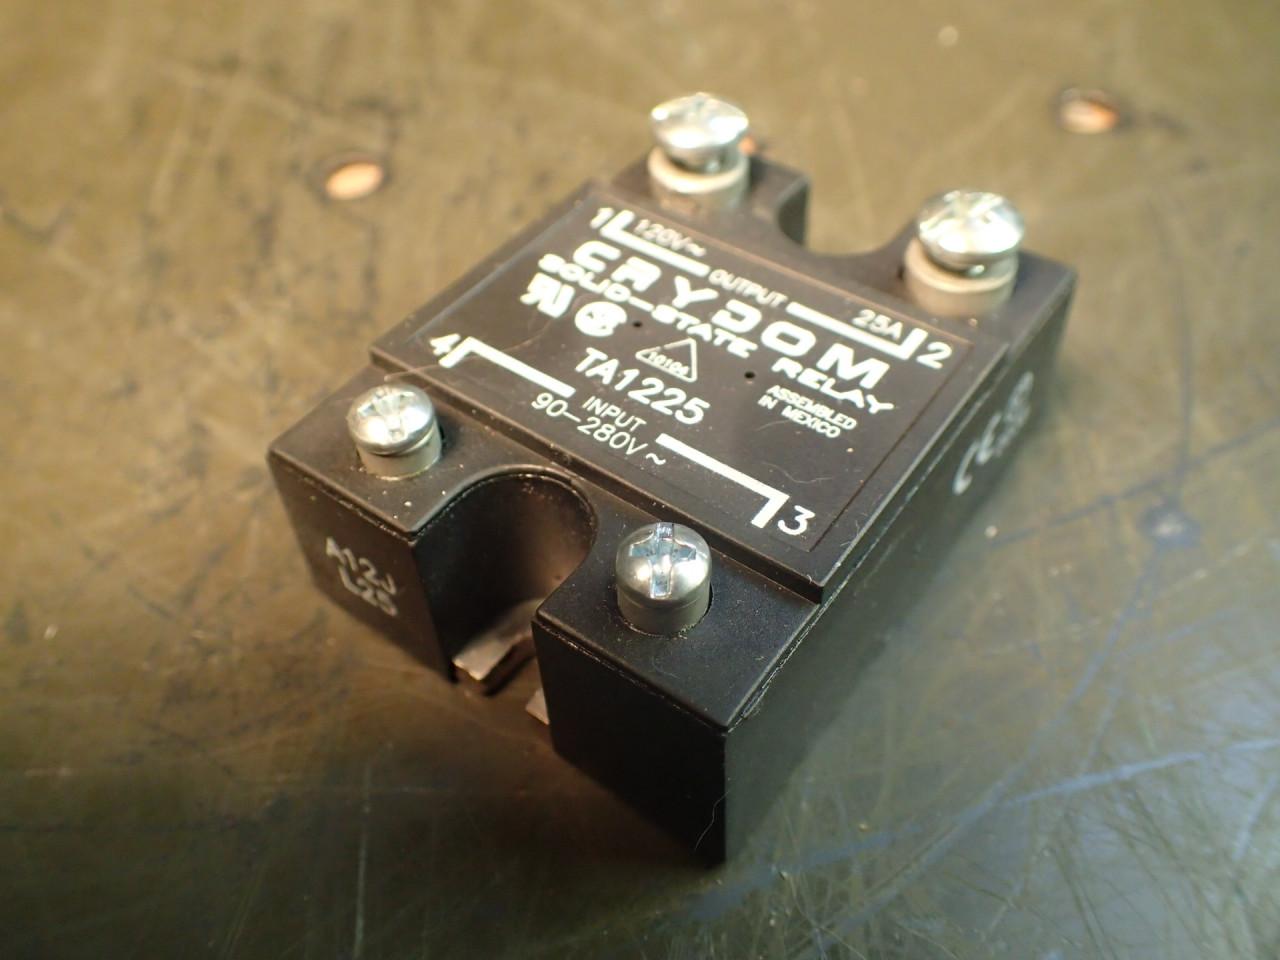 Watlow Kona 81 20 116 Band Heater 240v 750w 2 Id X Long Solid State Relay Crydom Ta1225 Ssr Input 90 280v Output 120v